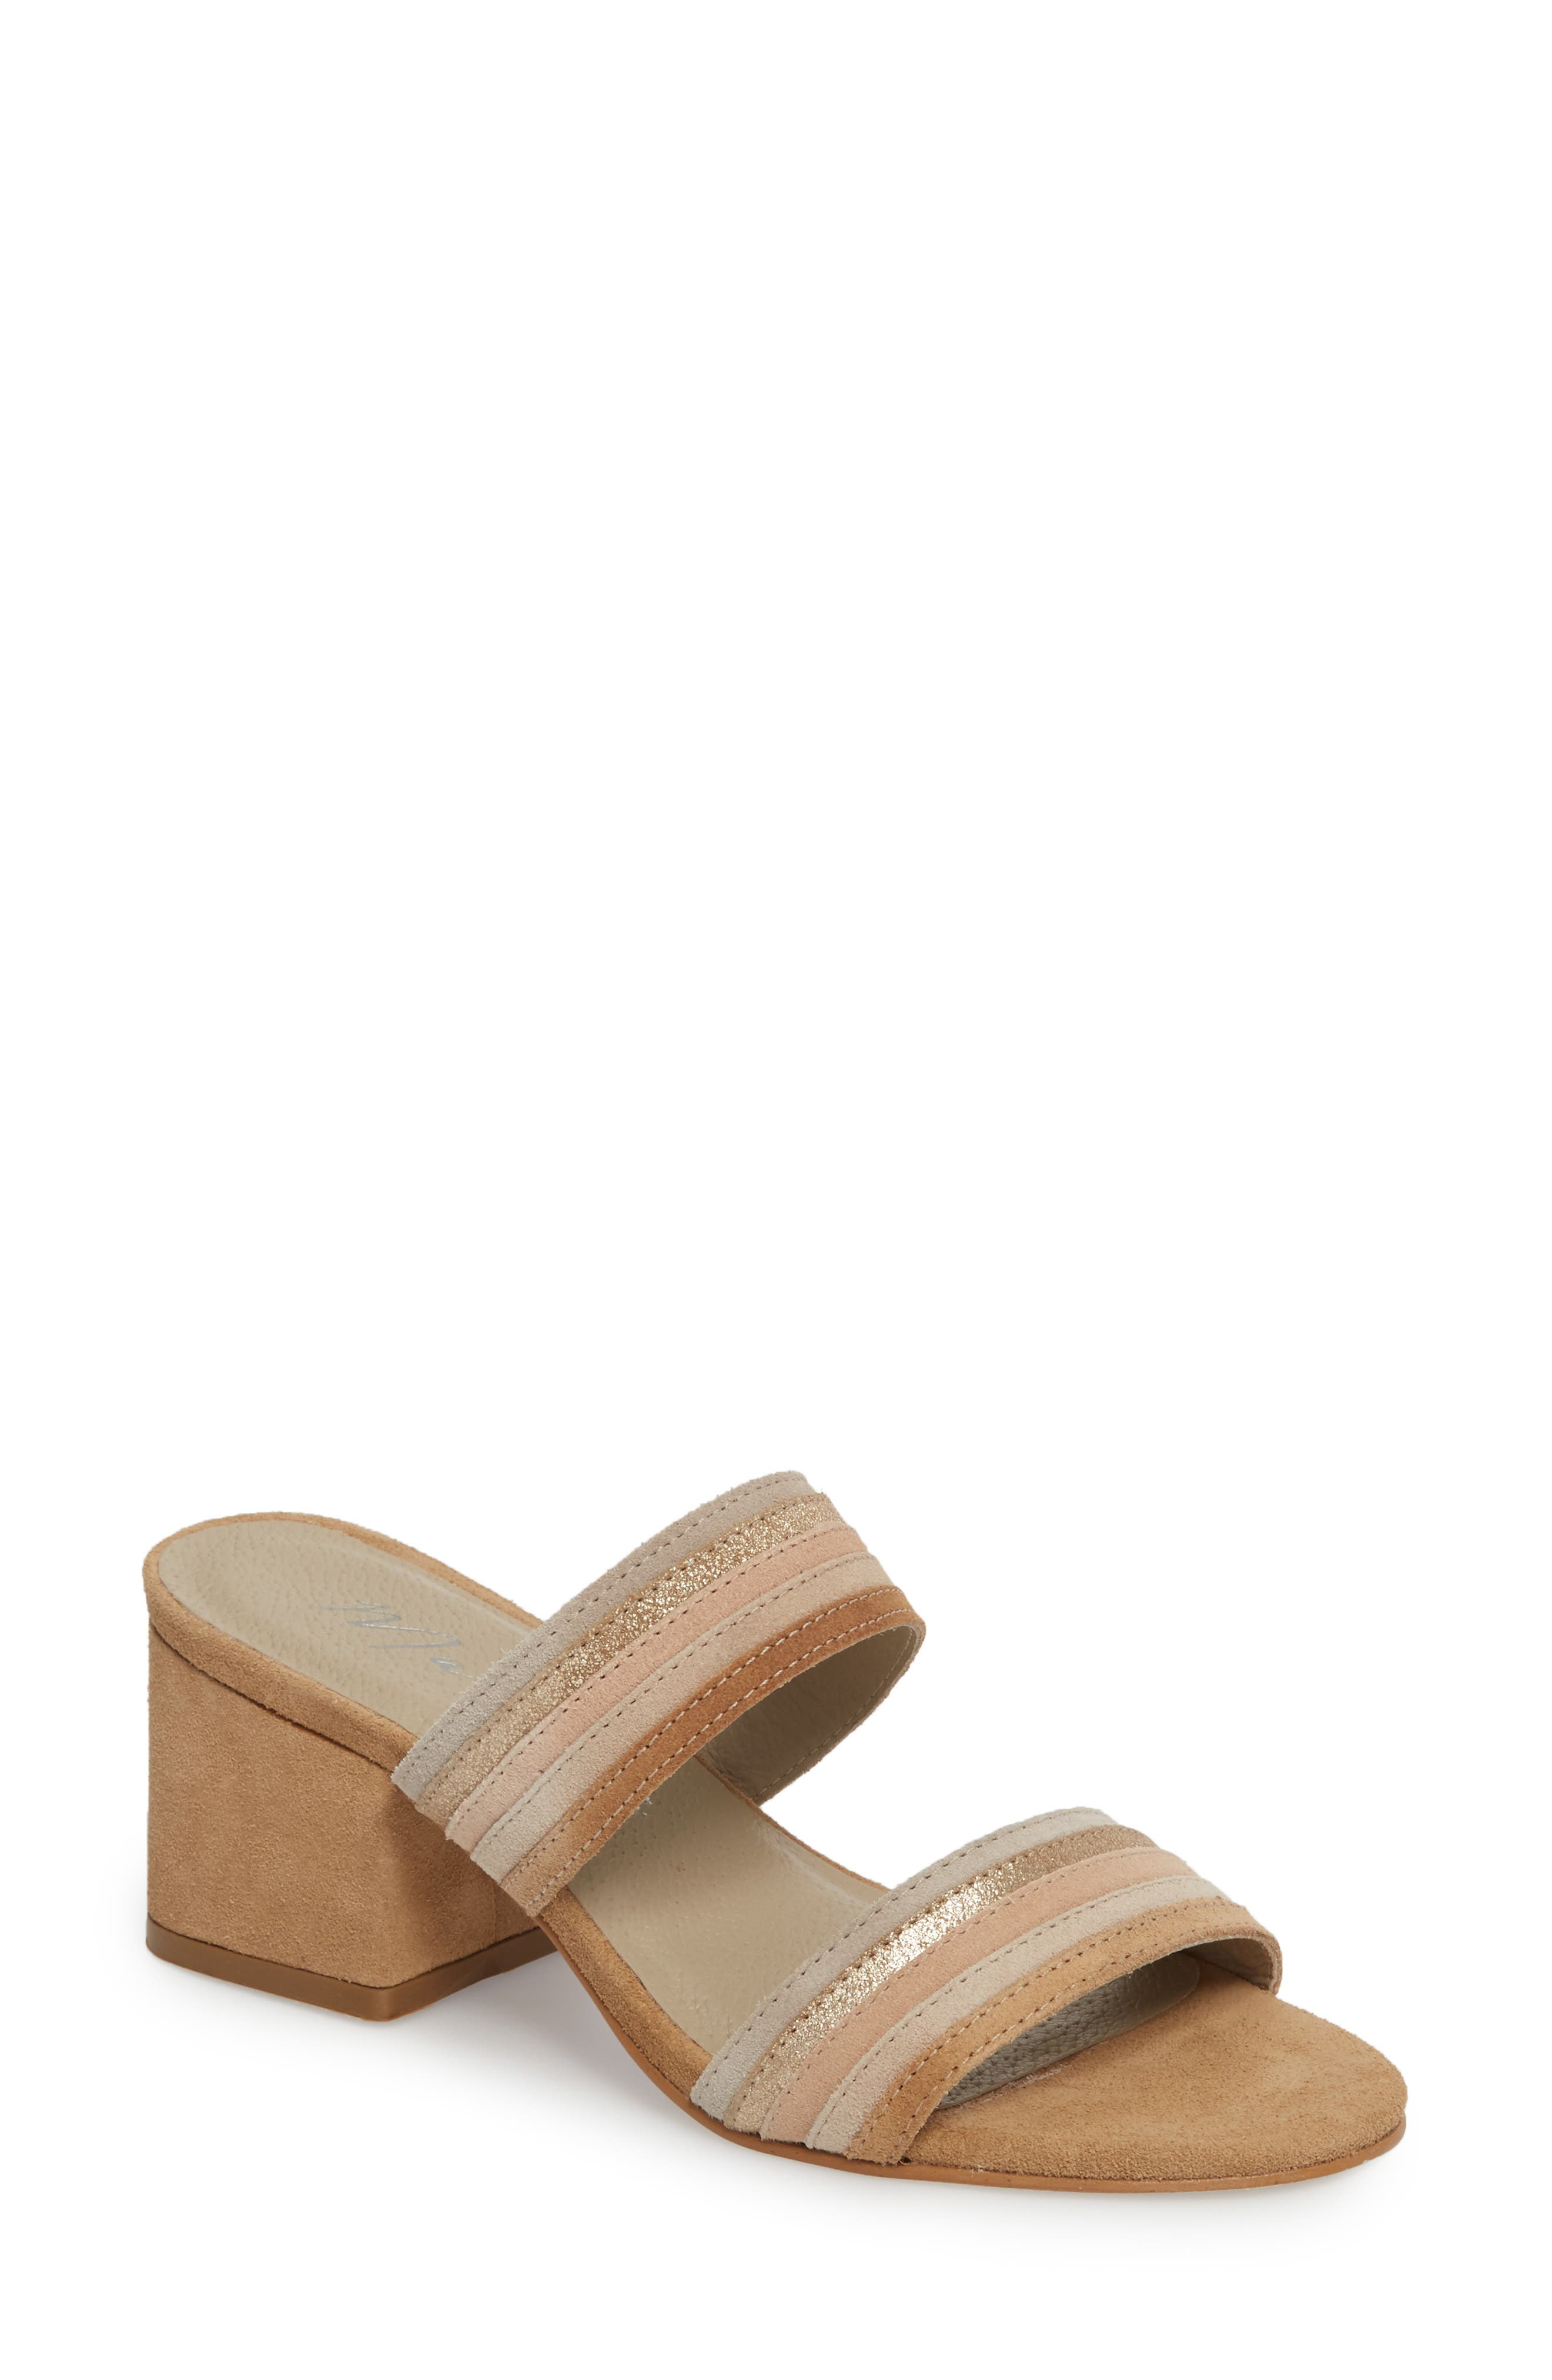 Matisse Bonita Slide Sandal, Beige